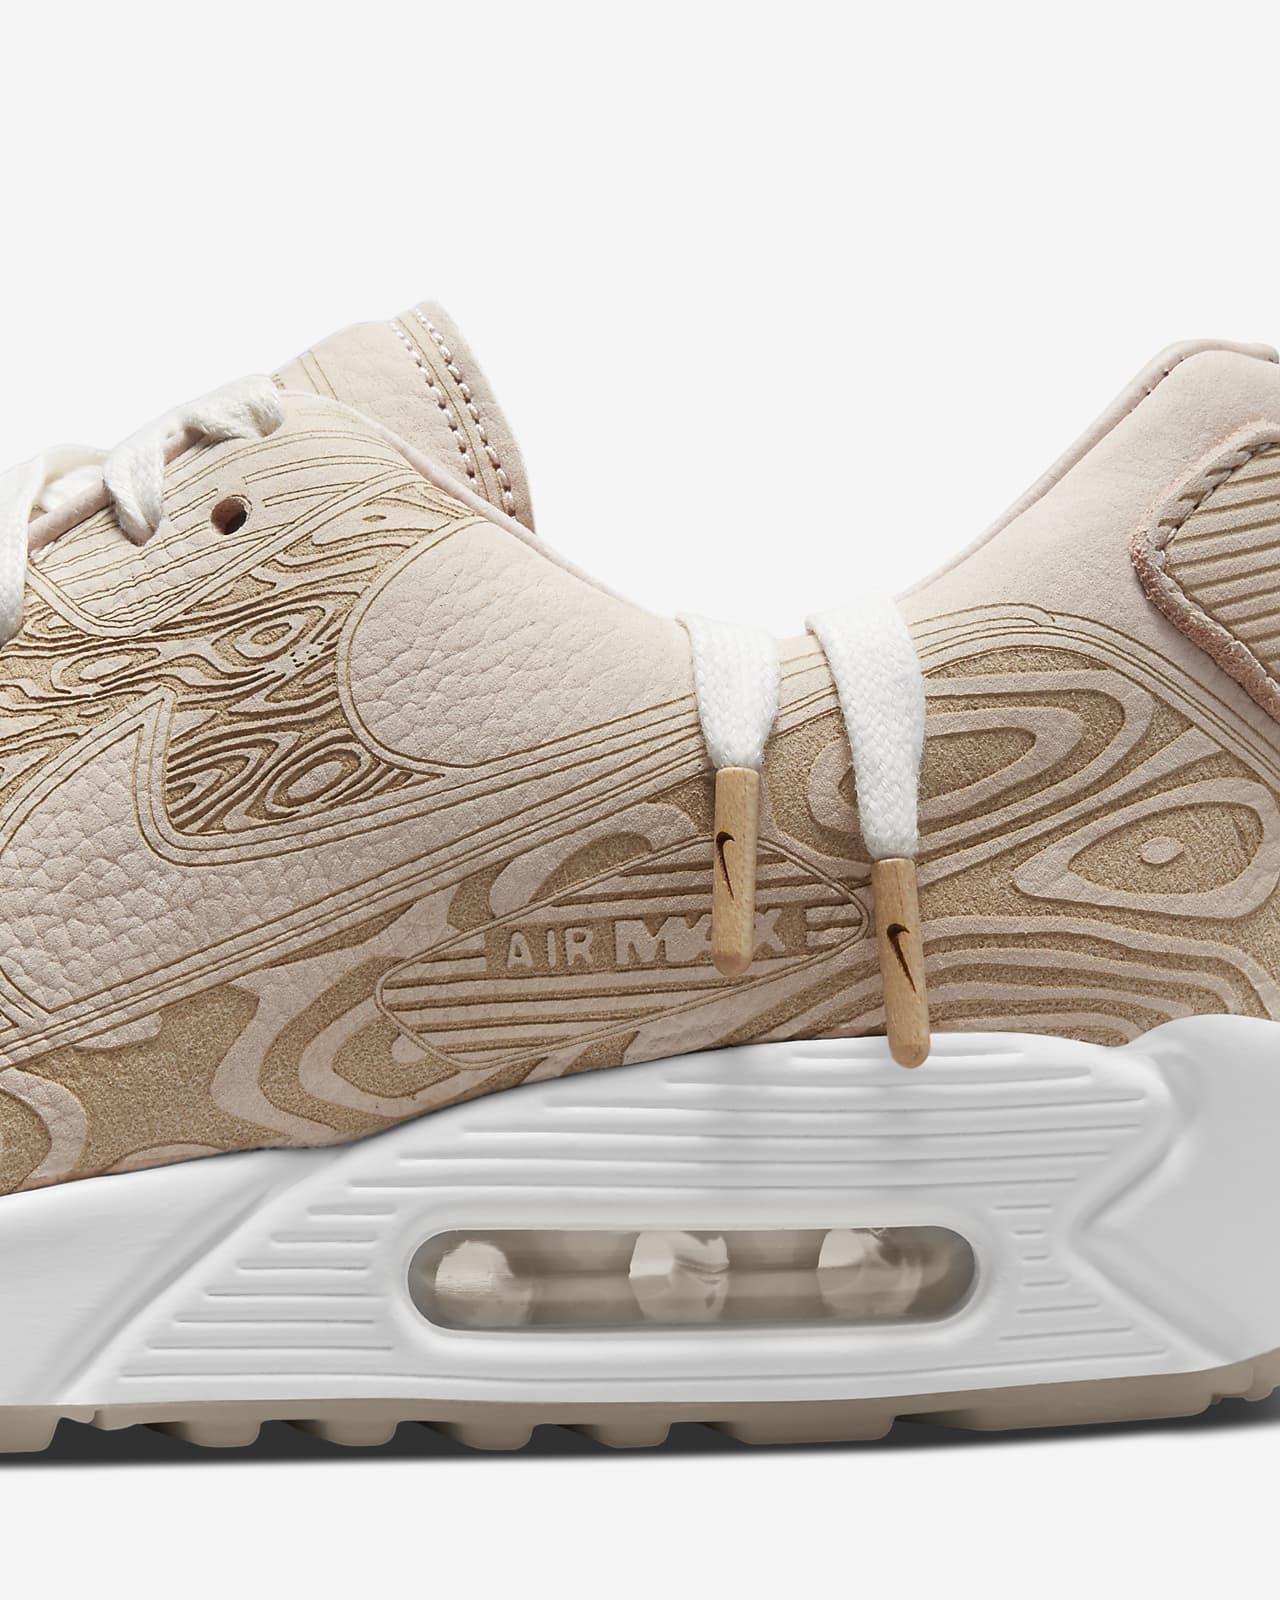 Nike Air Max 90 QS Laser Men's Shoes